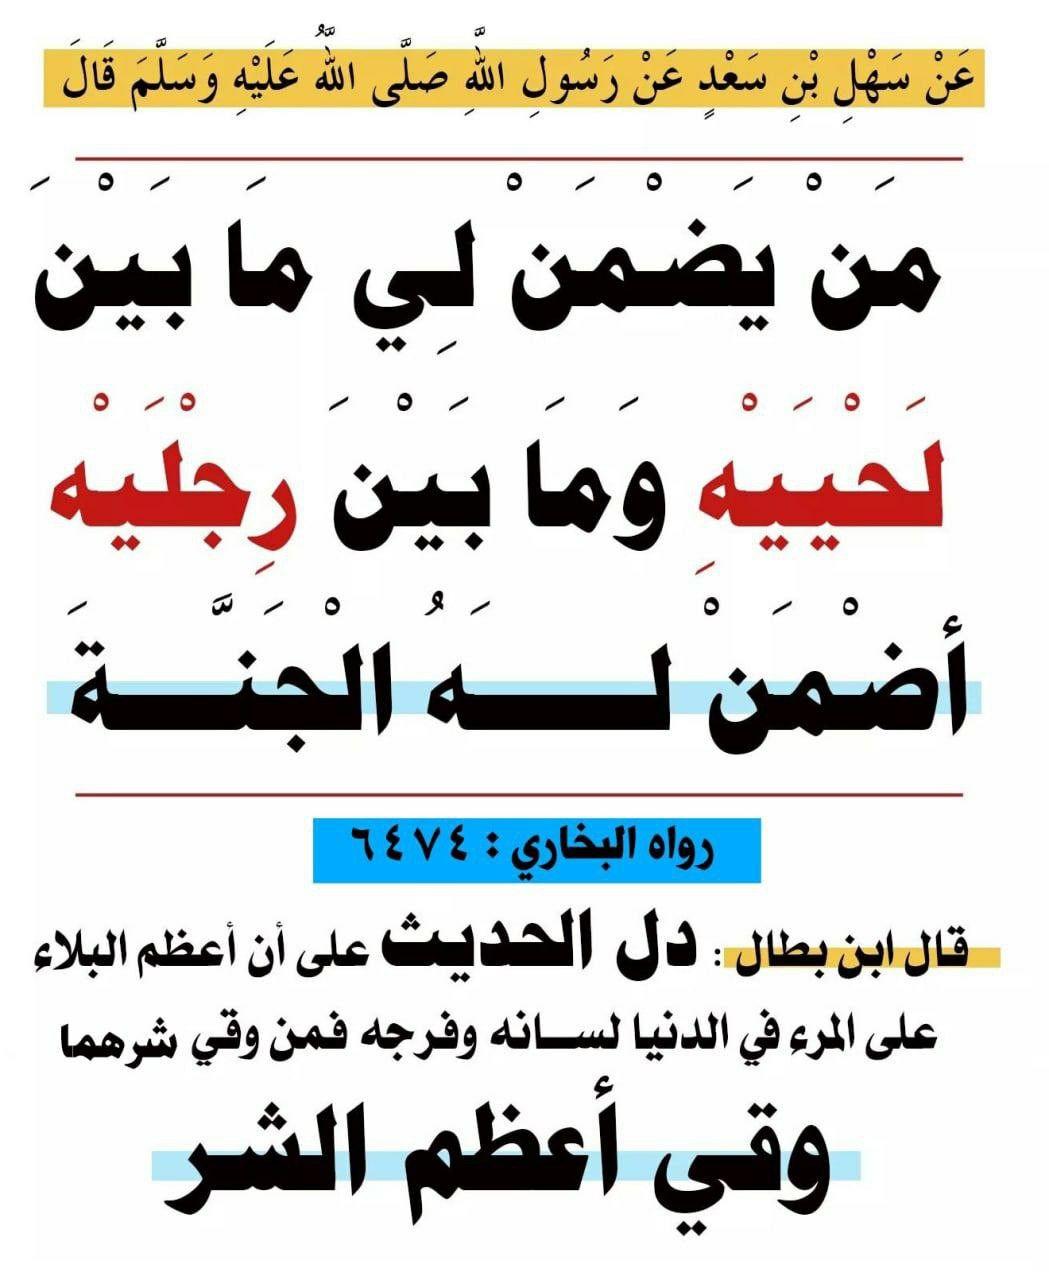 Pin By Maged Egy On الأحاديث النبوية الشريفة In 2021 Hadeeth Ramadan Mecca Kaaba